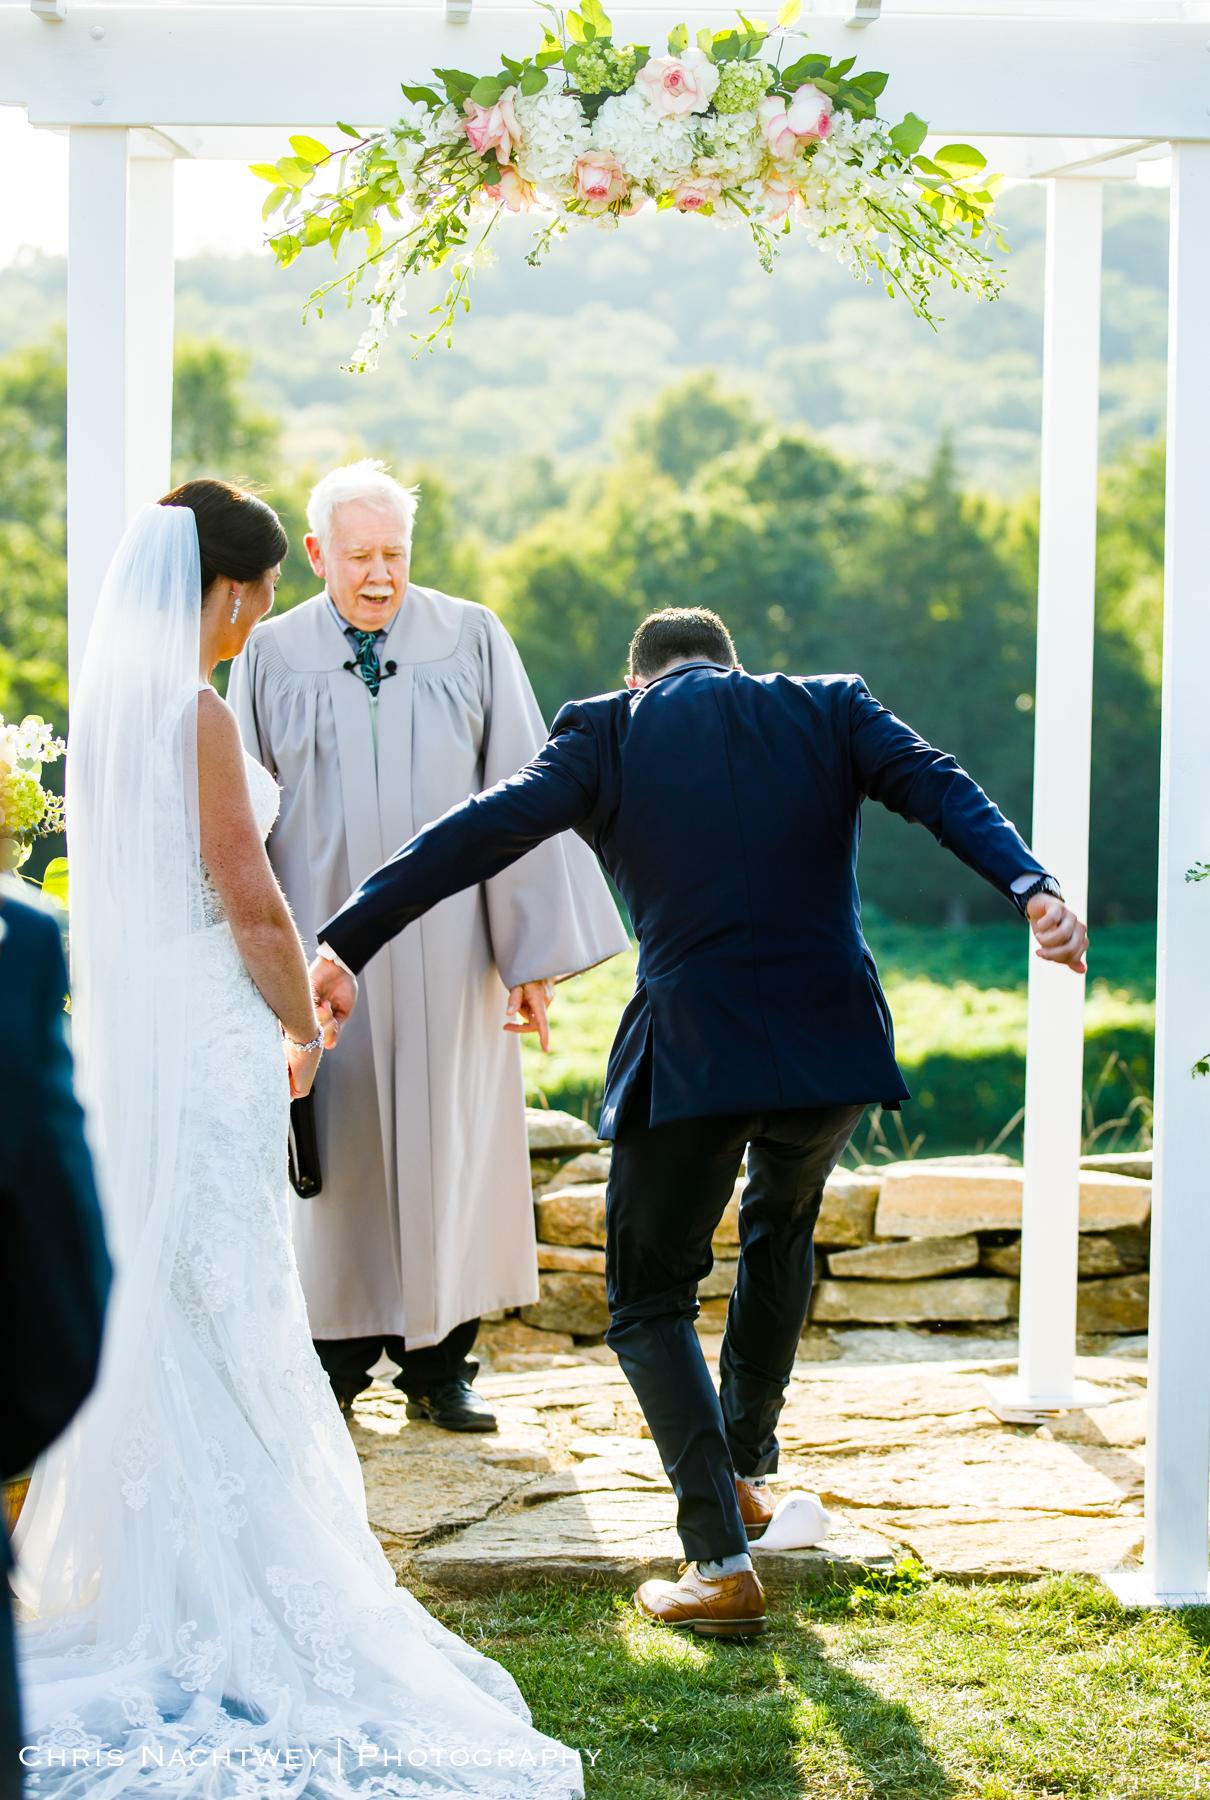 wedding-lake-of-isles-photos-chris-nachtwey-photography-2019-35.jpg